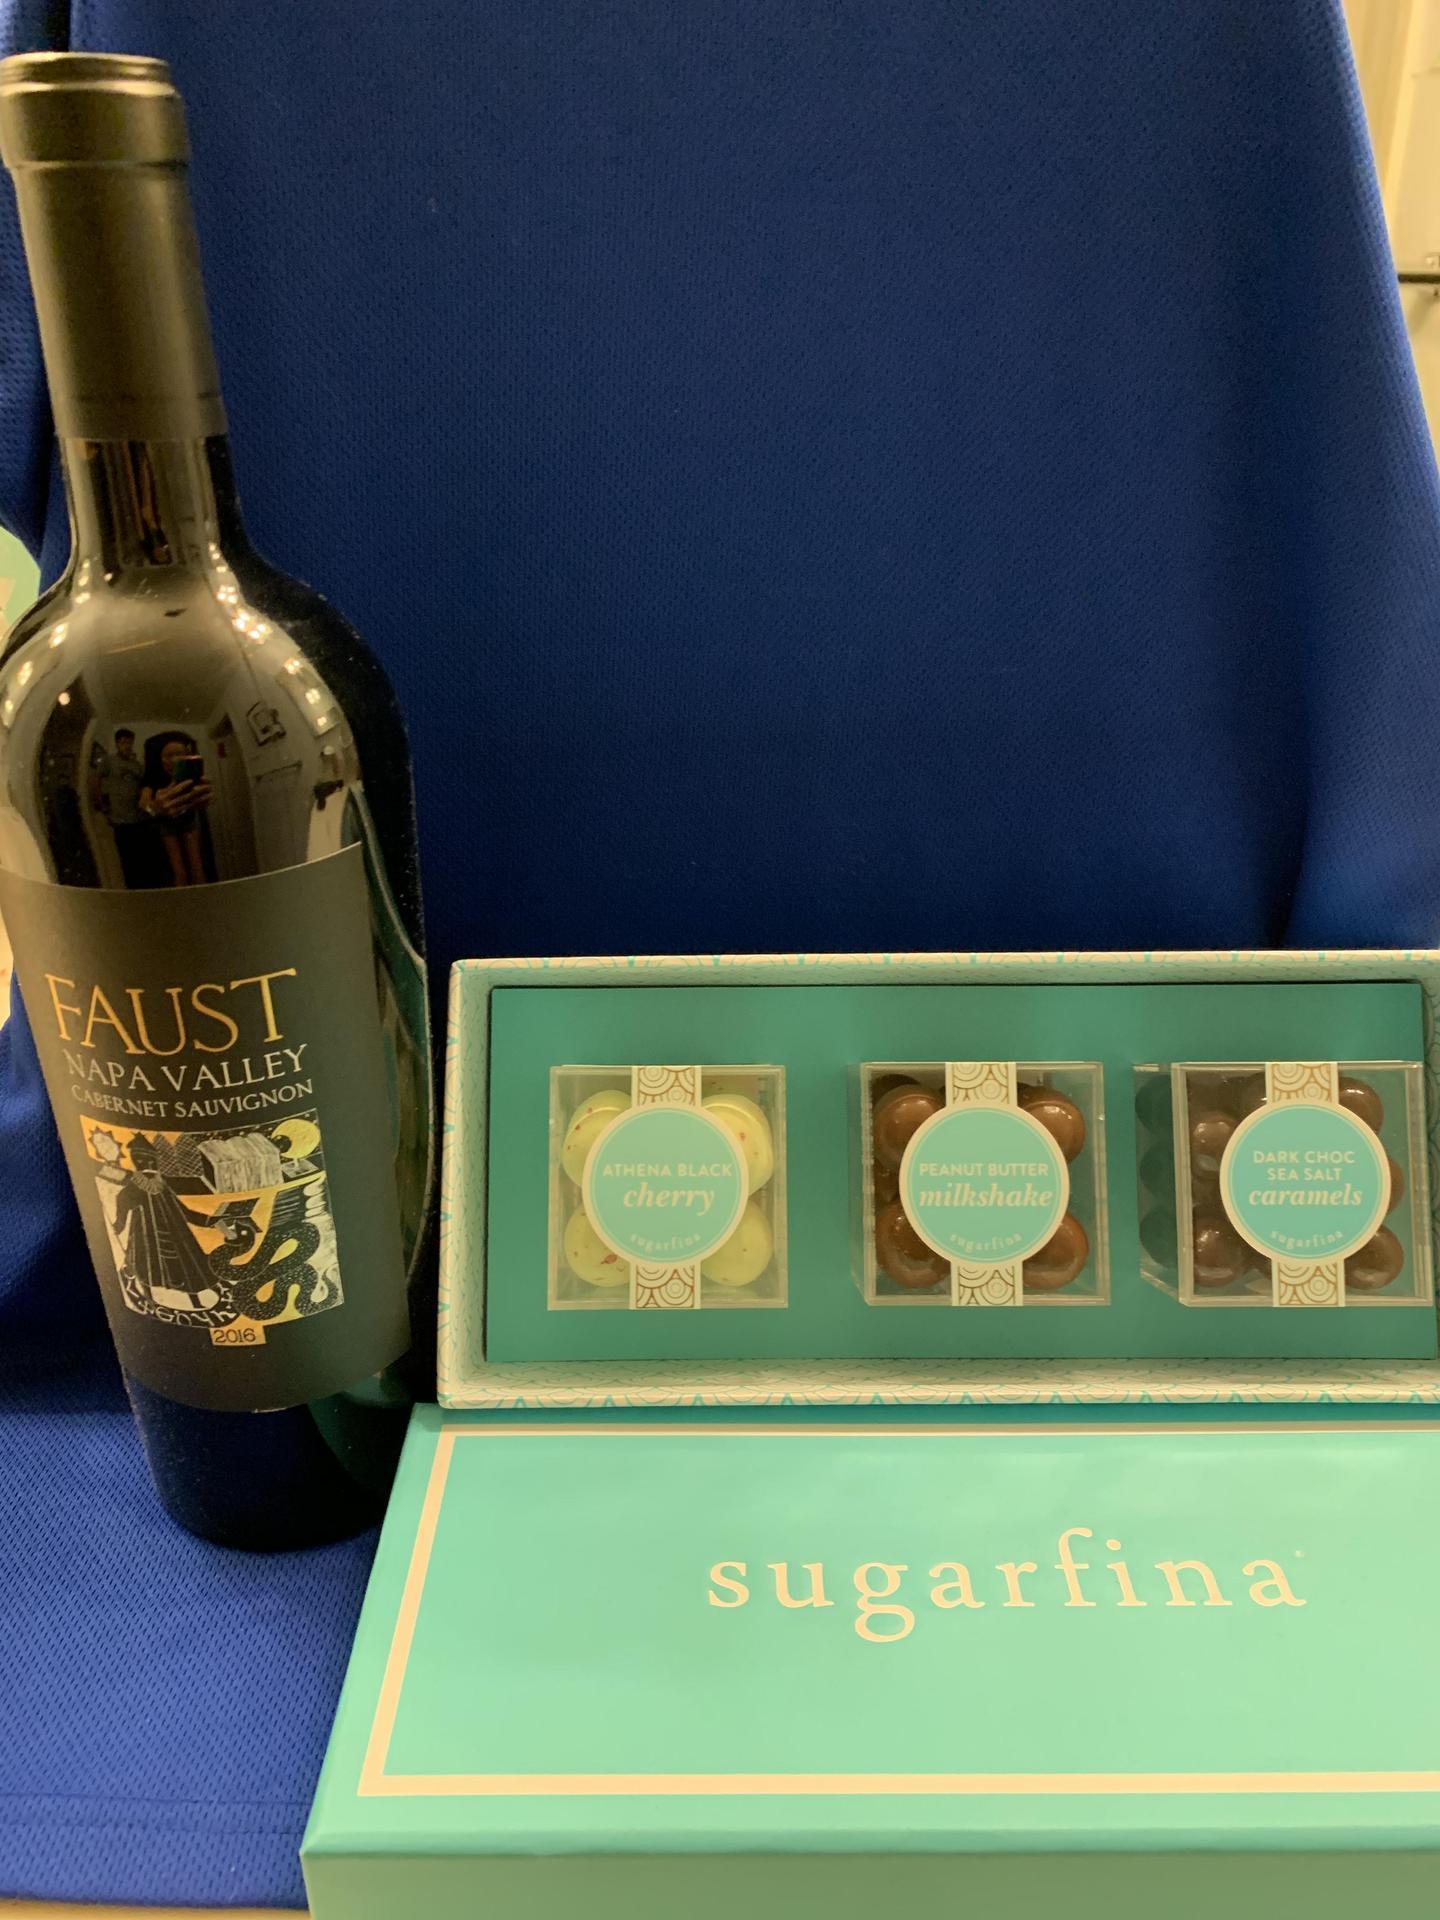 Bottle of Faust & Sugarfina